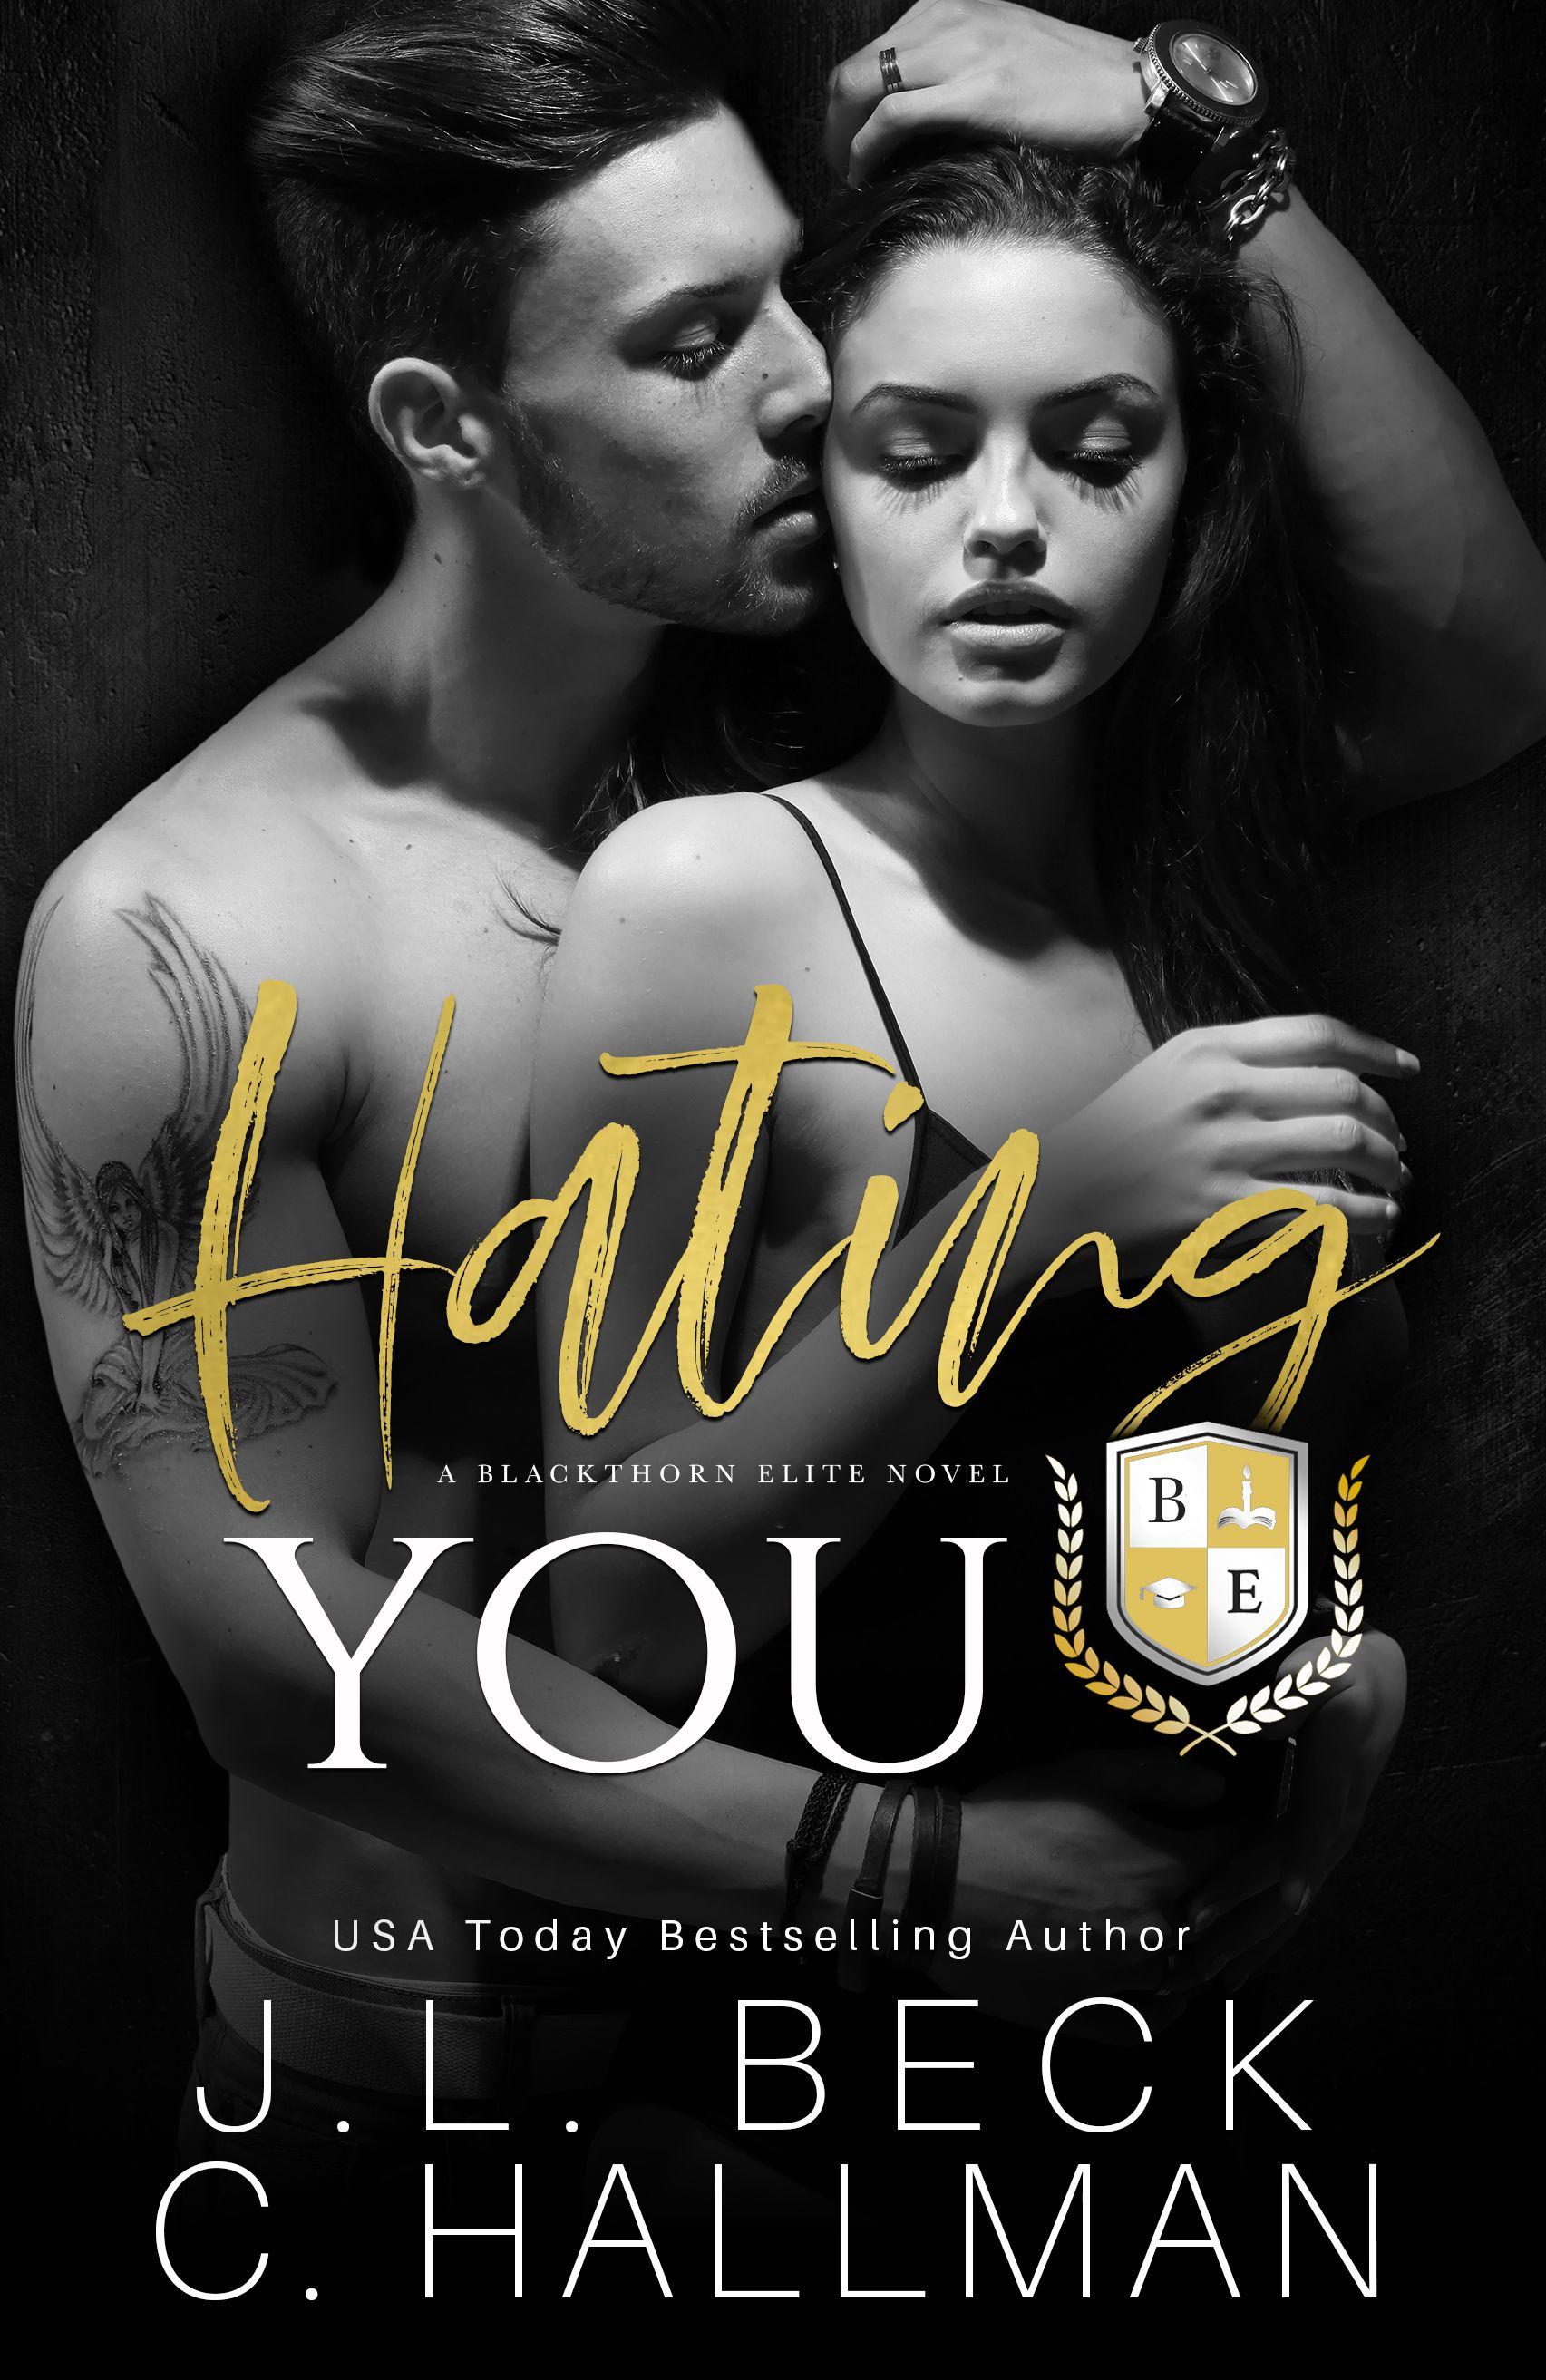 Hating You Dark Romance Books Free Romance Books Books About Bullying